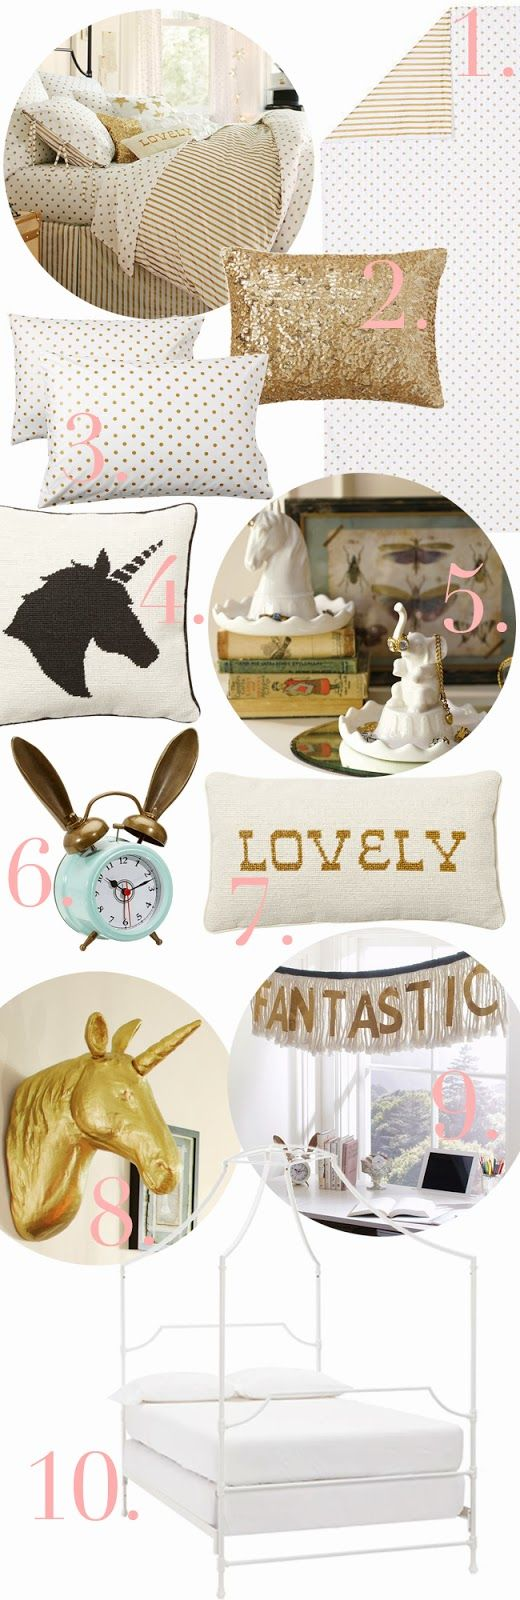 Sunday Shopping: Cuddle Up // Emily & Meritt x @Pottery Barn Teen Collection